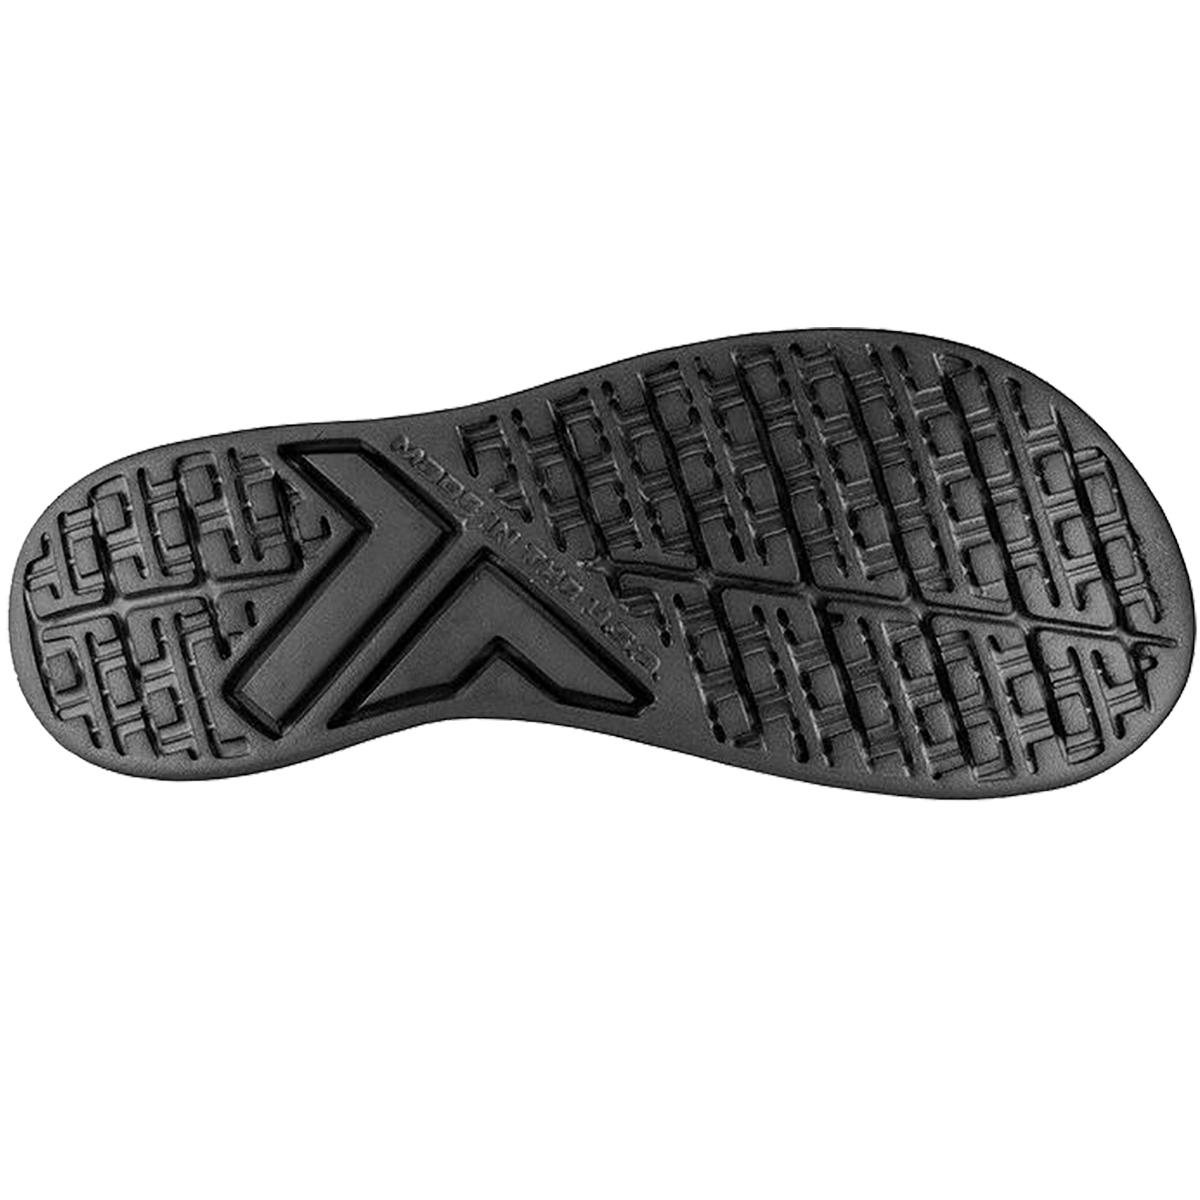 Telic-Unisex-Signature-Style-Arch-Support-Pain-Relief-Flip-Flops thumbnail 6